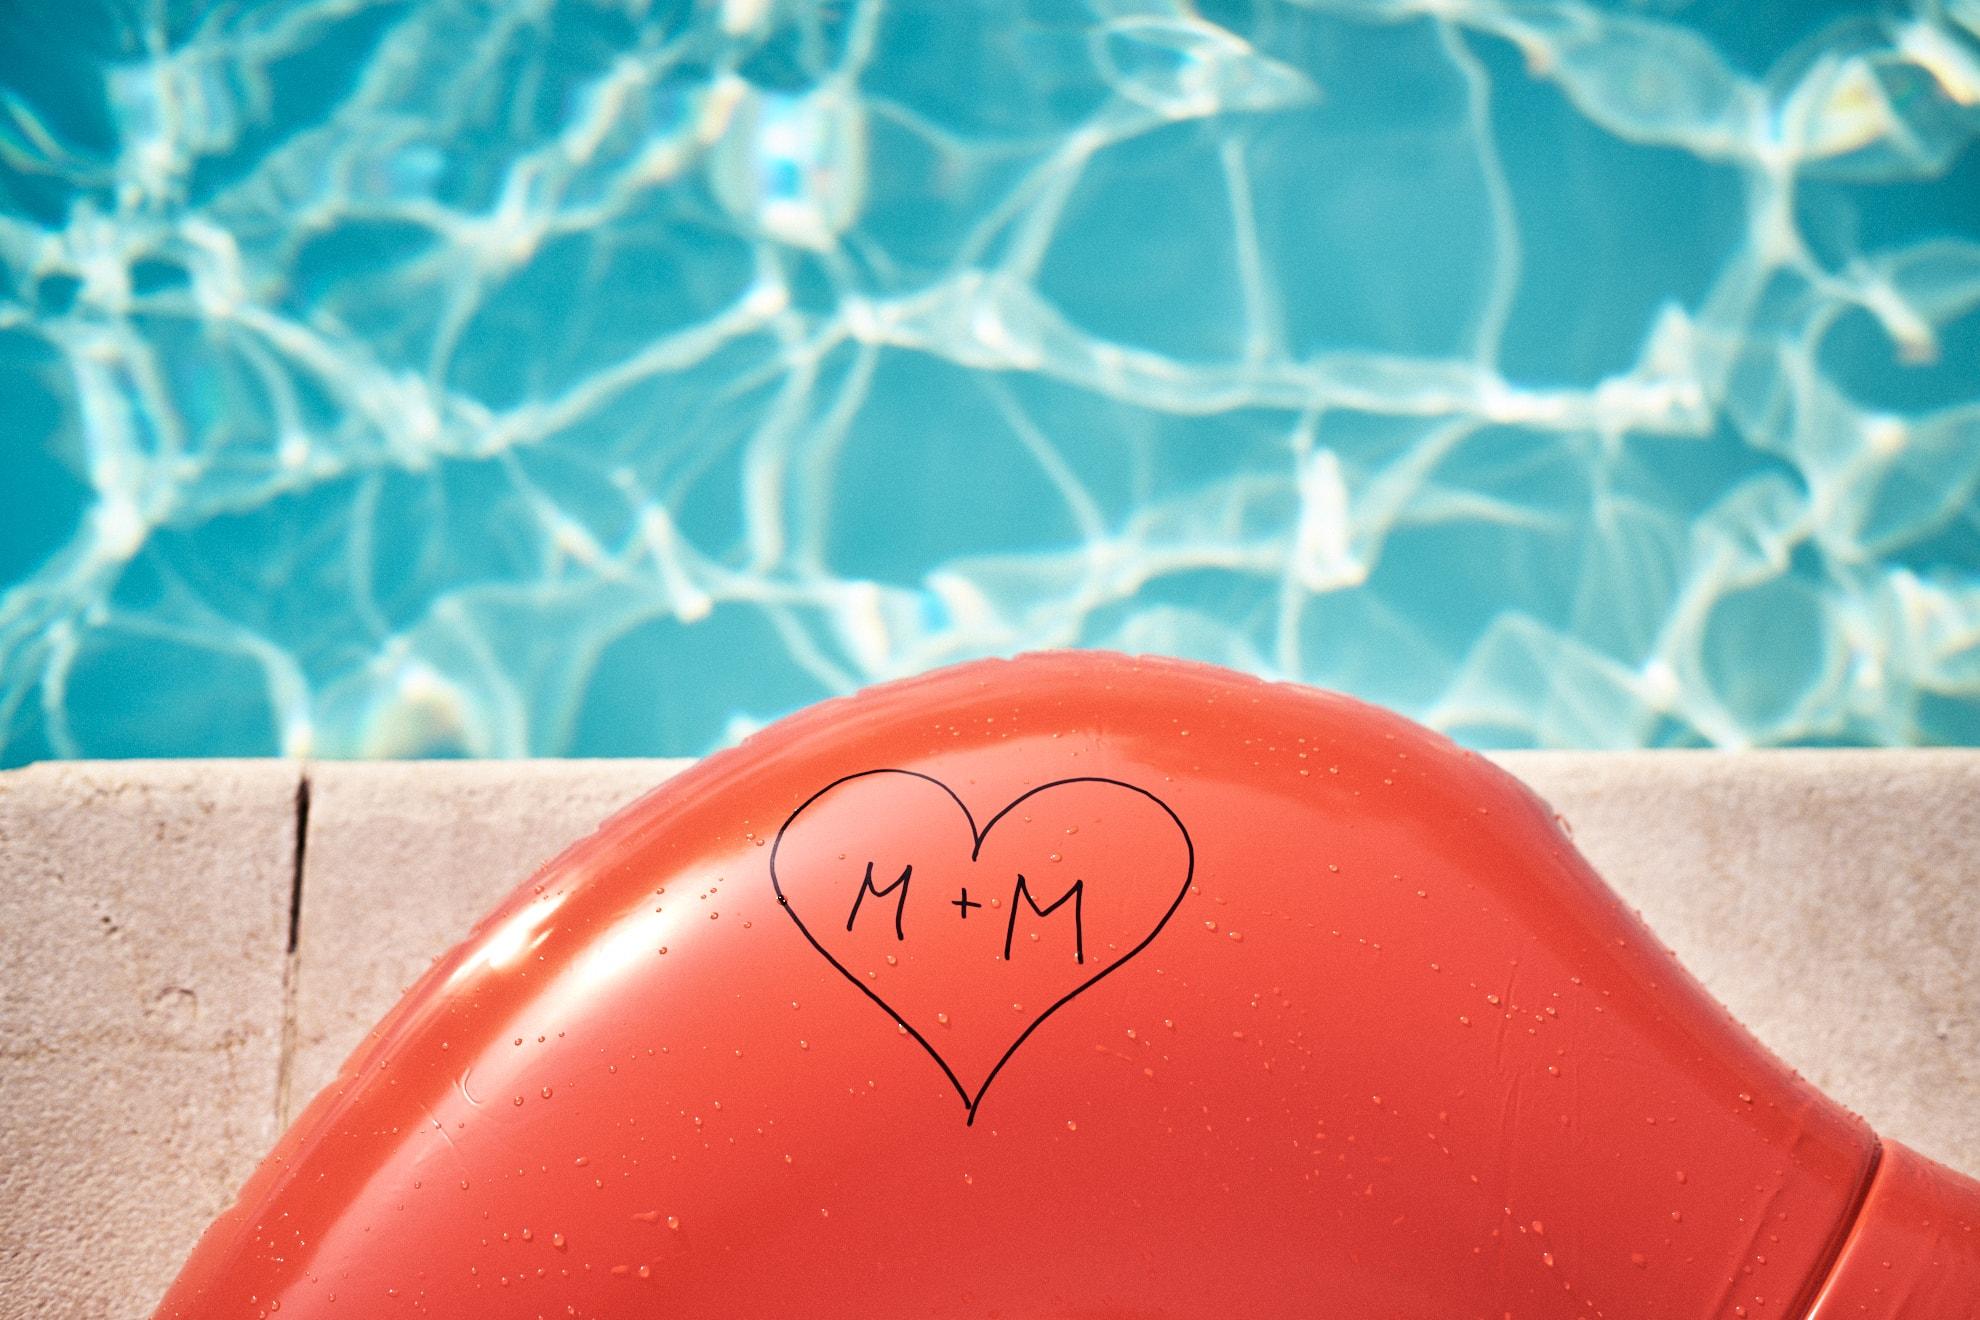 gonfiabile a bordo piscina con nomi sposi